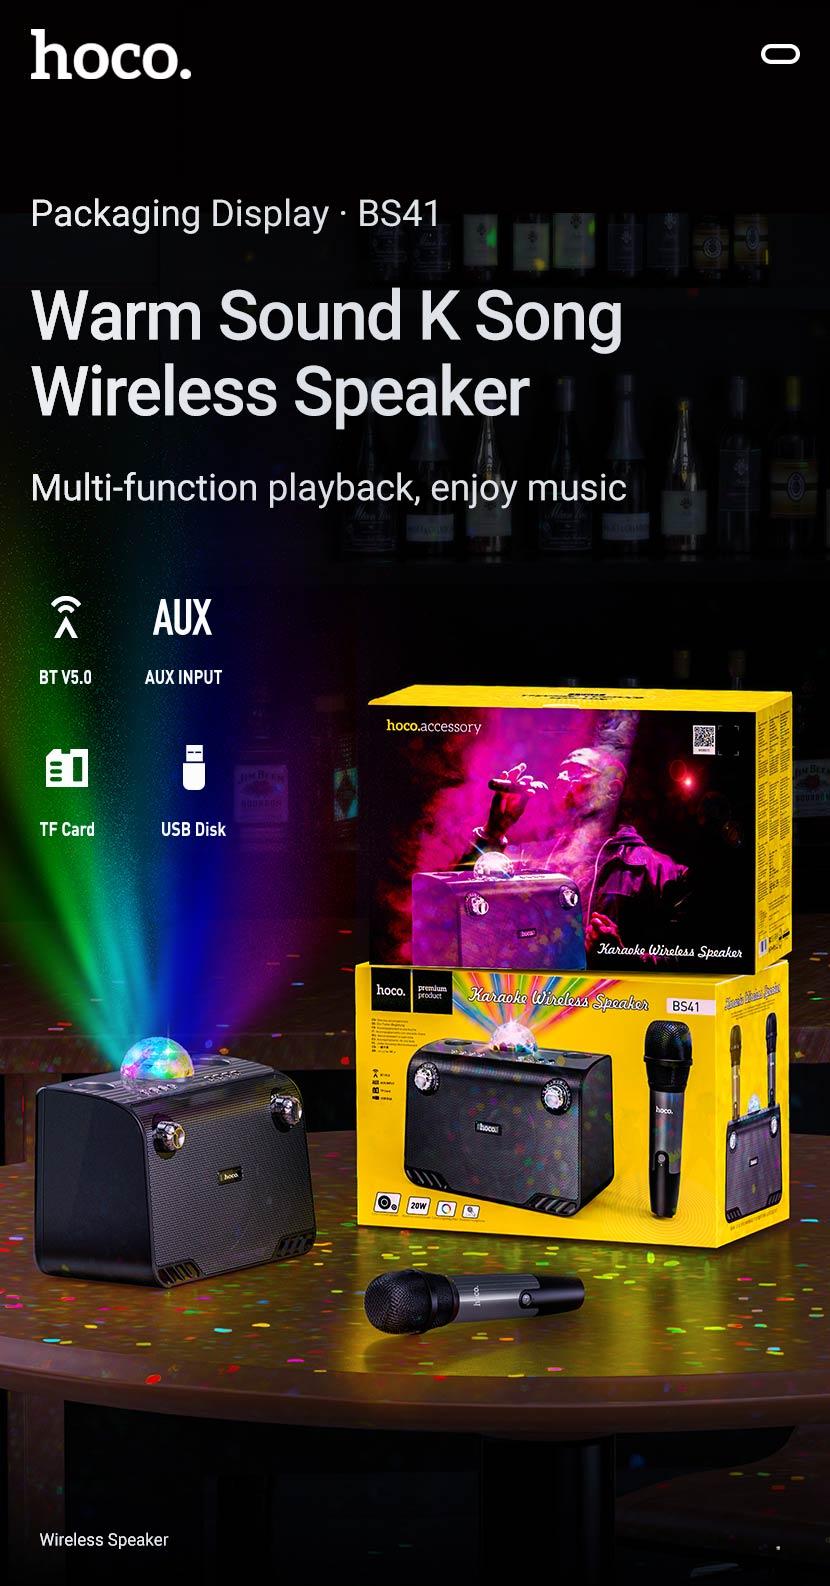 hoco news bs41 warm sound k song wireless speaker package en